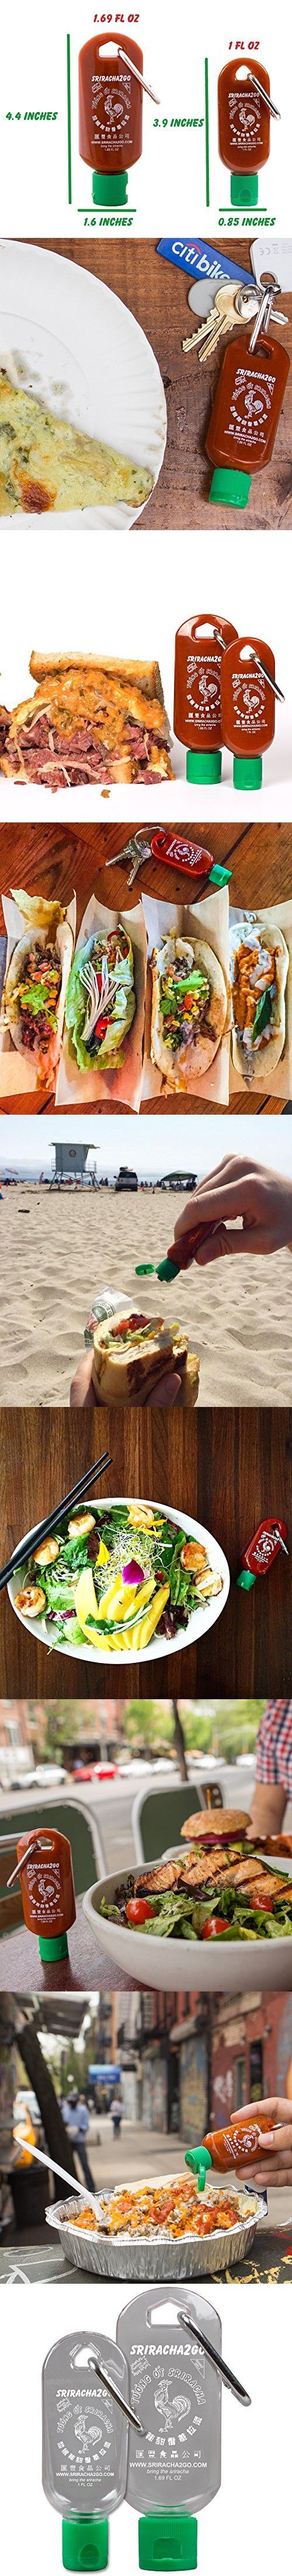 Sriracha Mini Keychain Combo Pack (1.7 Ounce and 1 Ounce, Sauce Not Included)